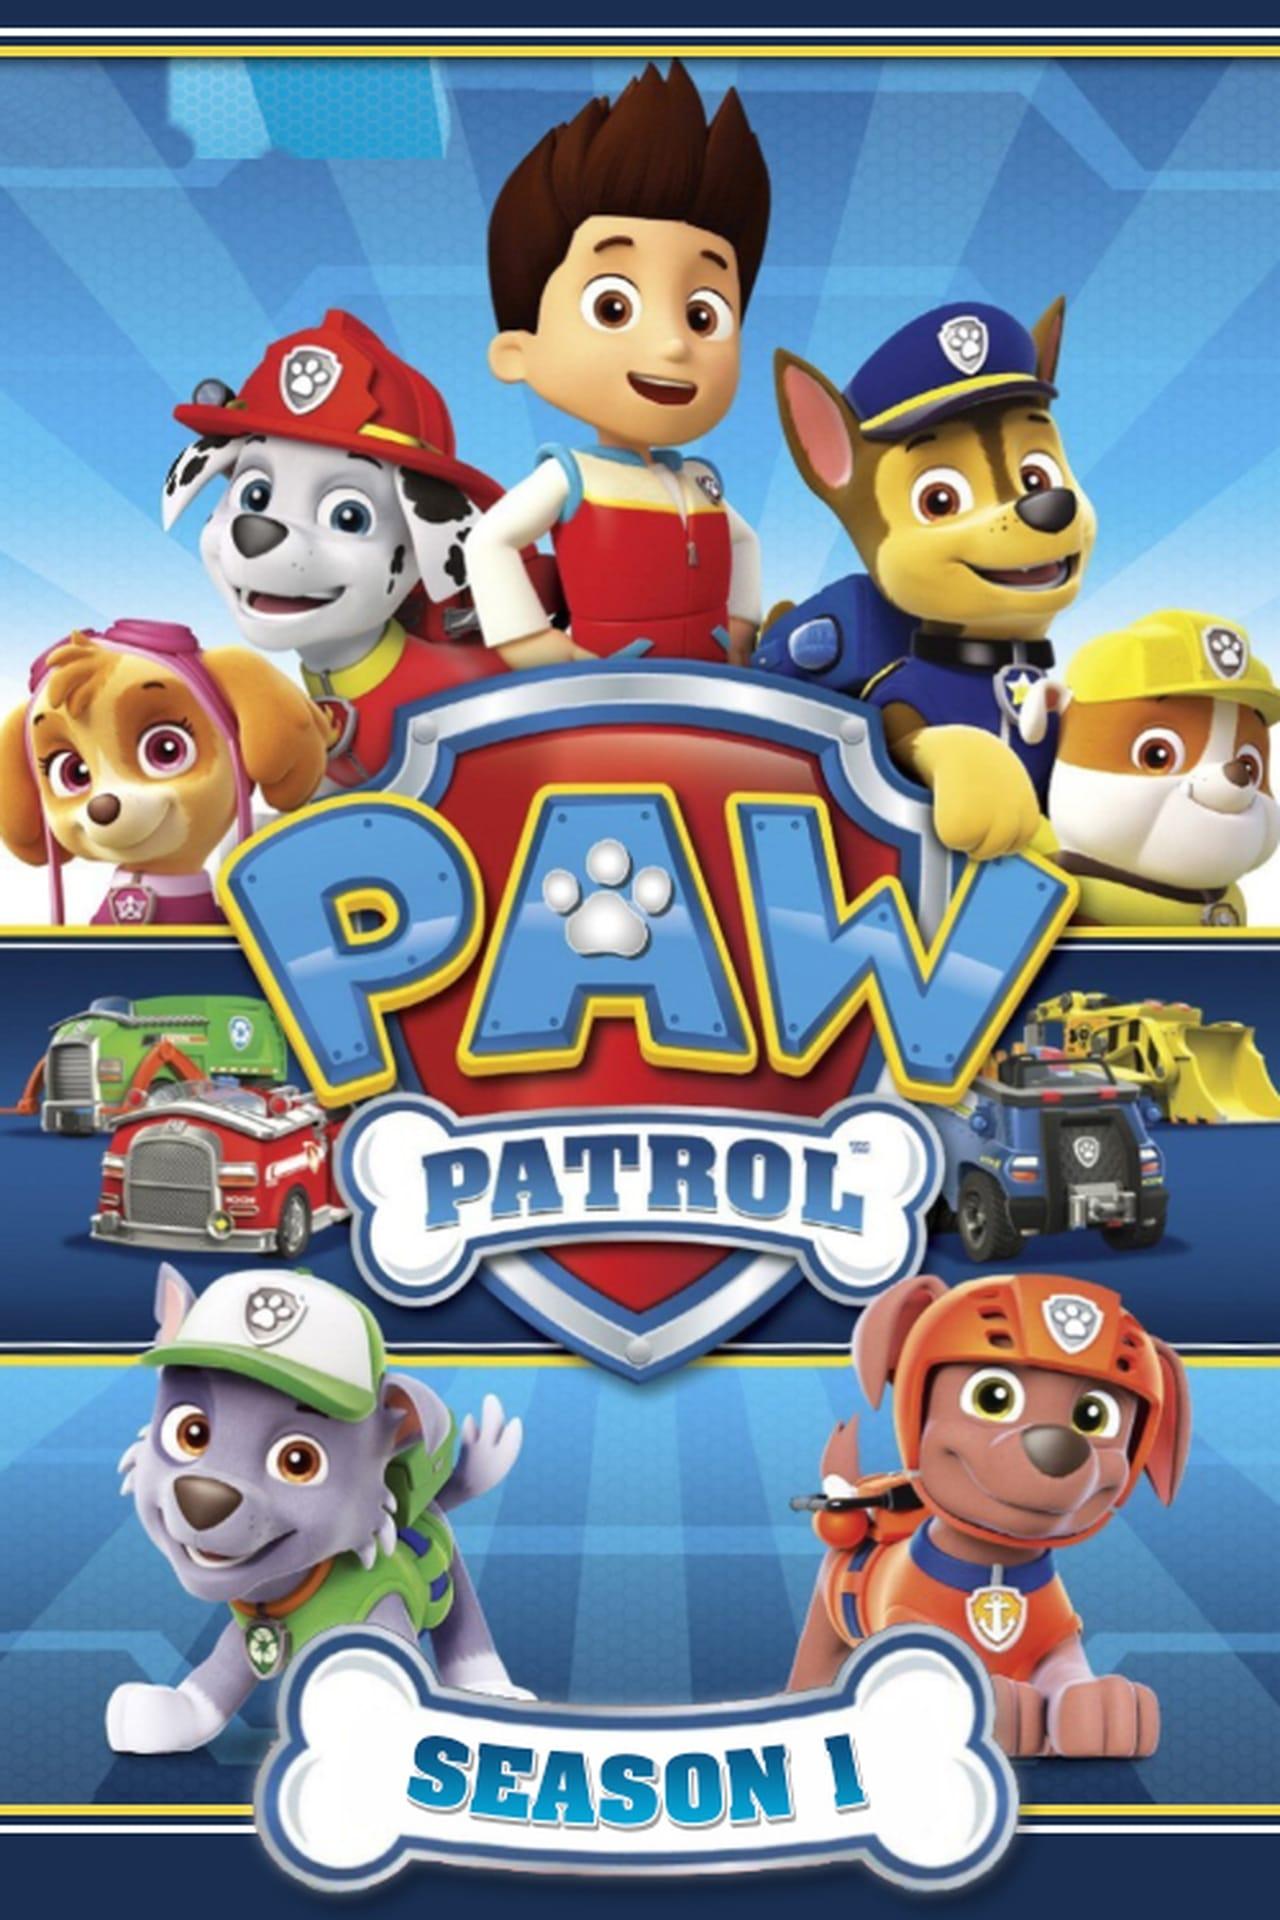 Watch Paw Patrol Season 1 Online